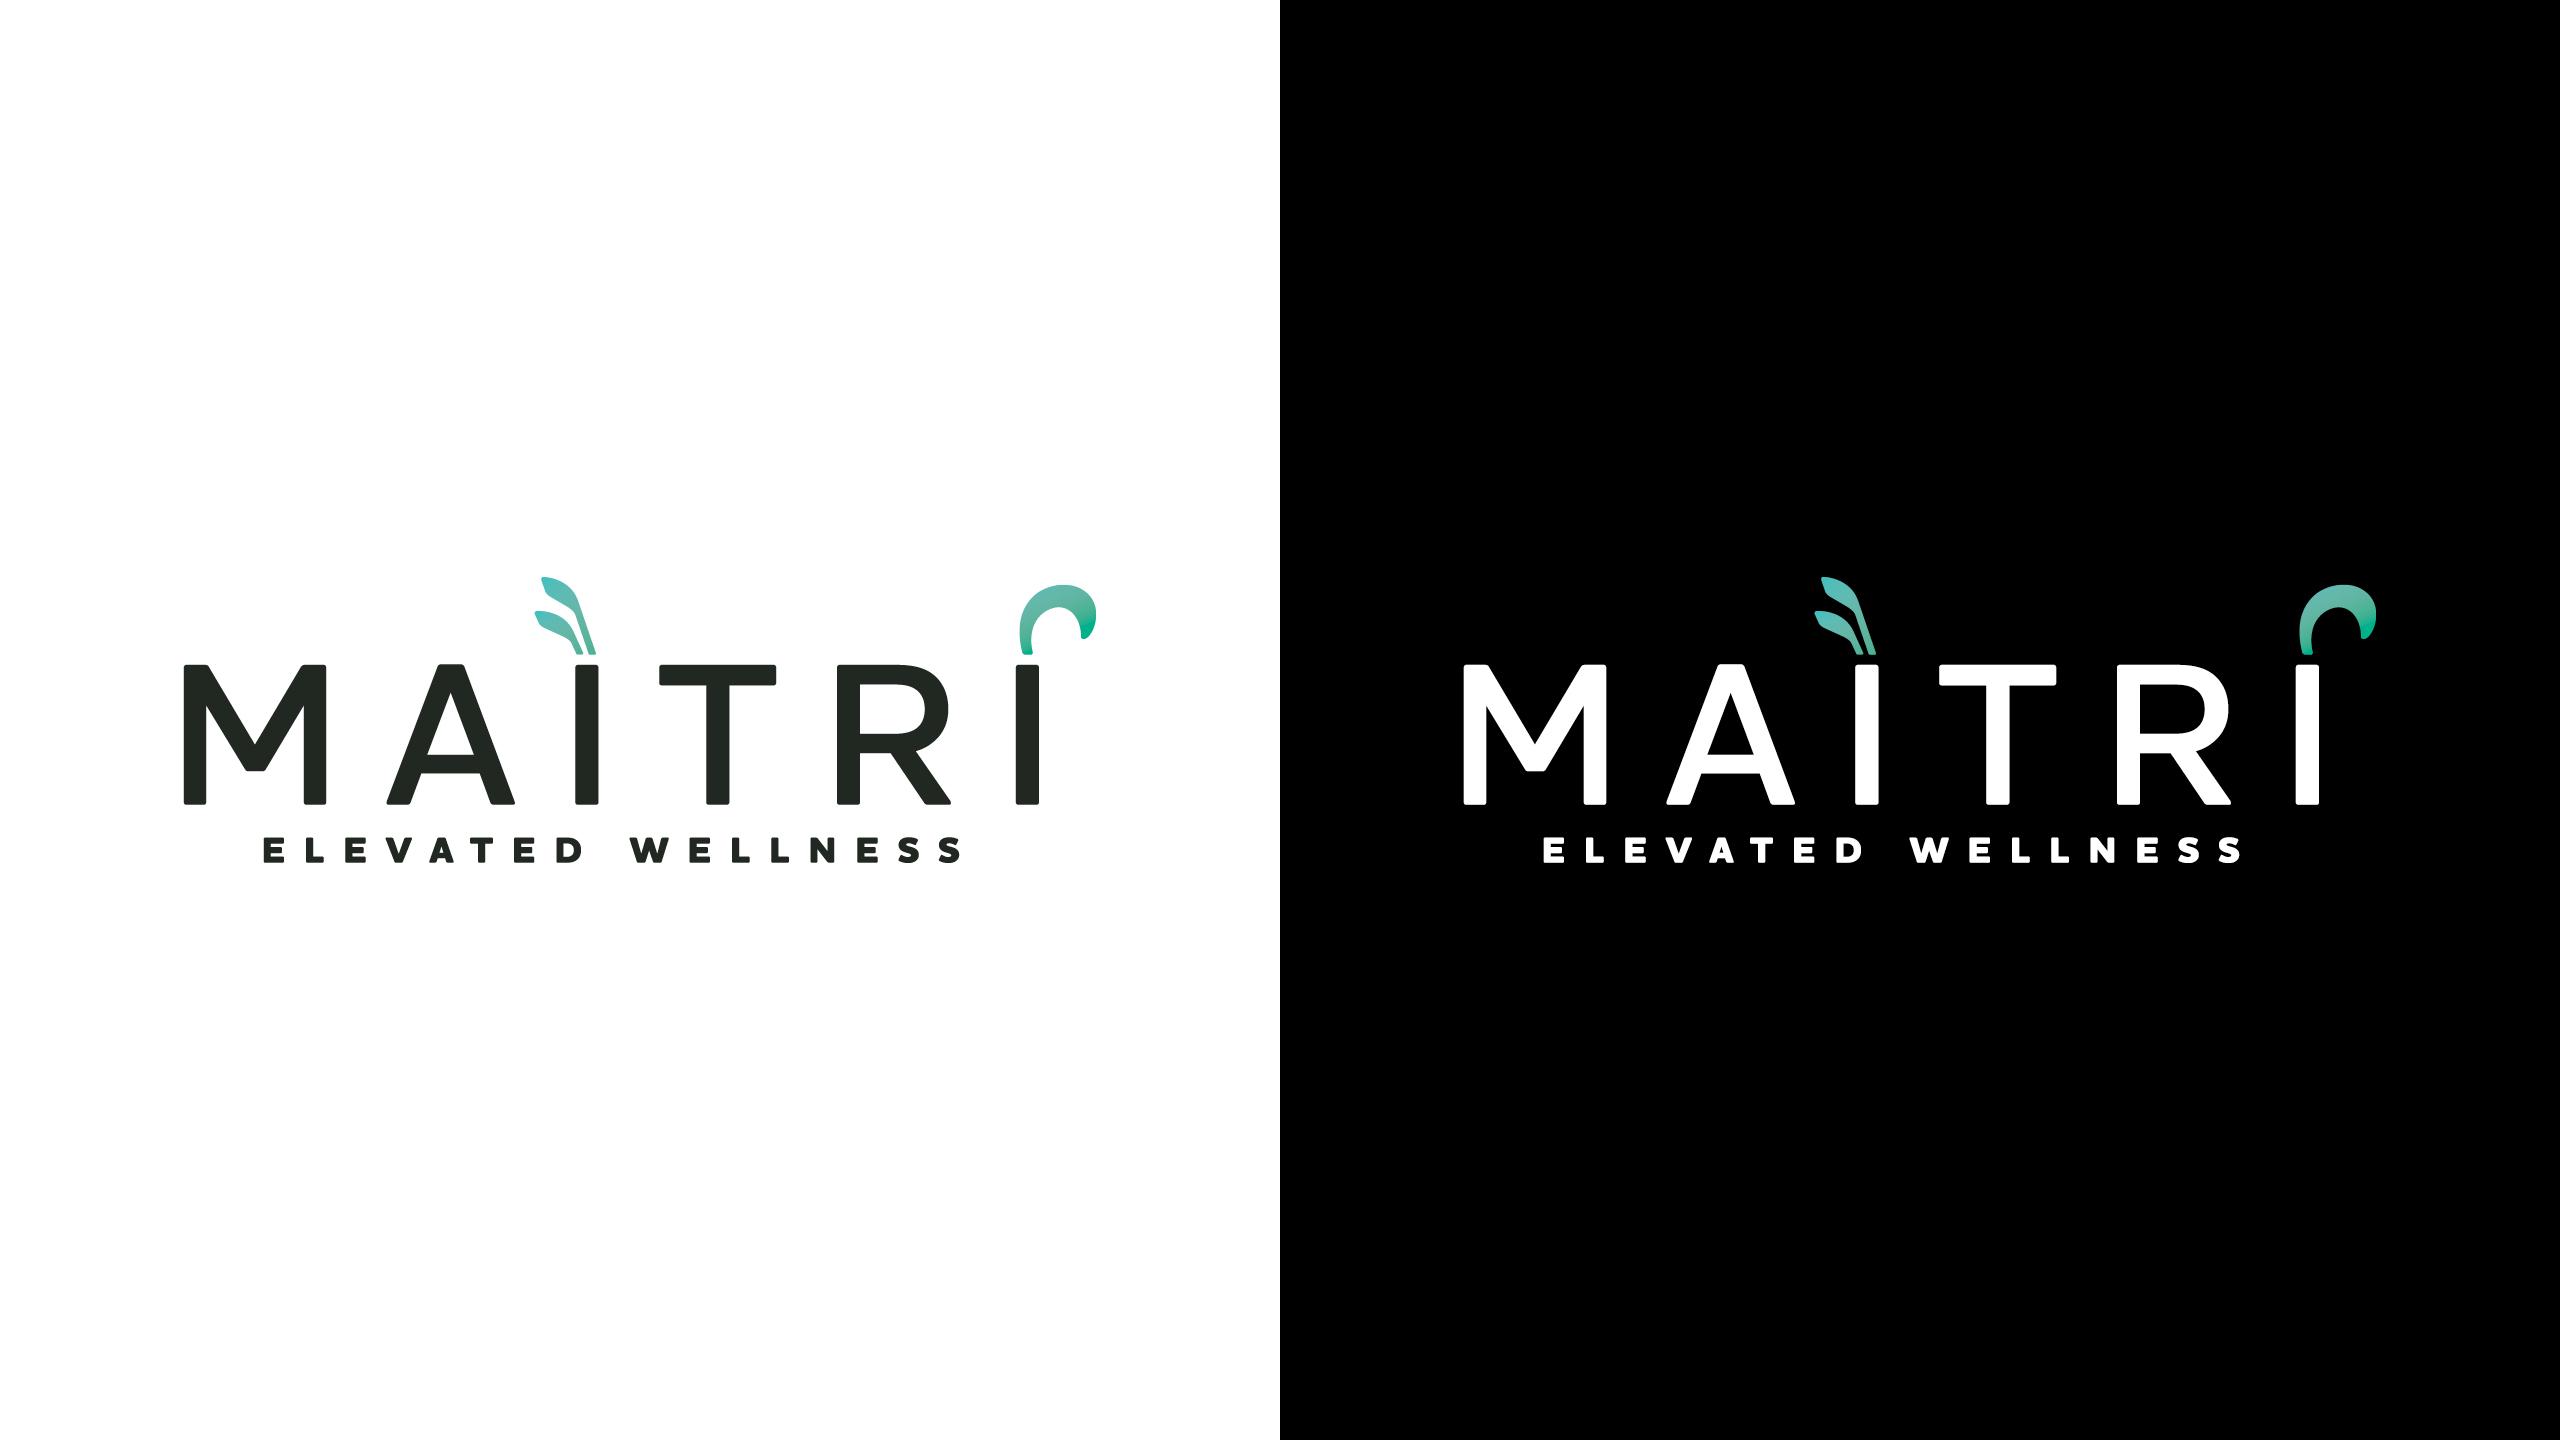 Maitri Medicinals Color Palette & Pattern Development by High Road Design Studio